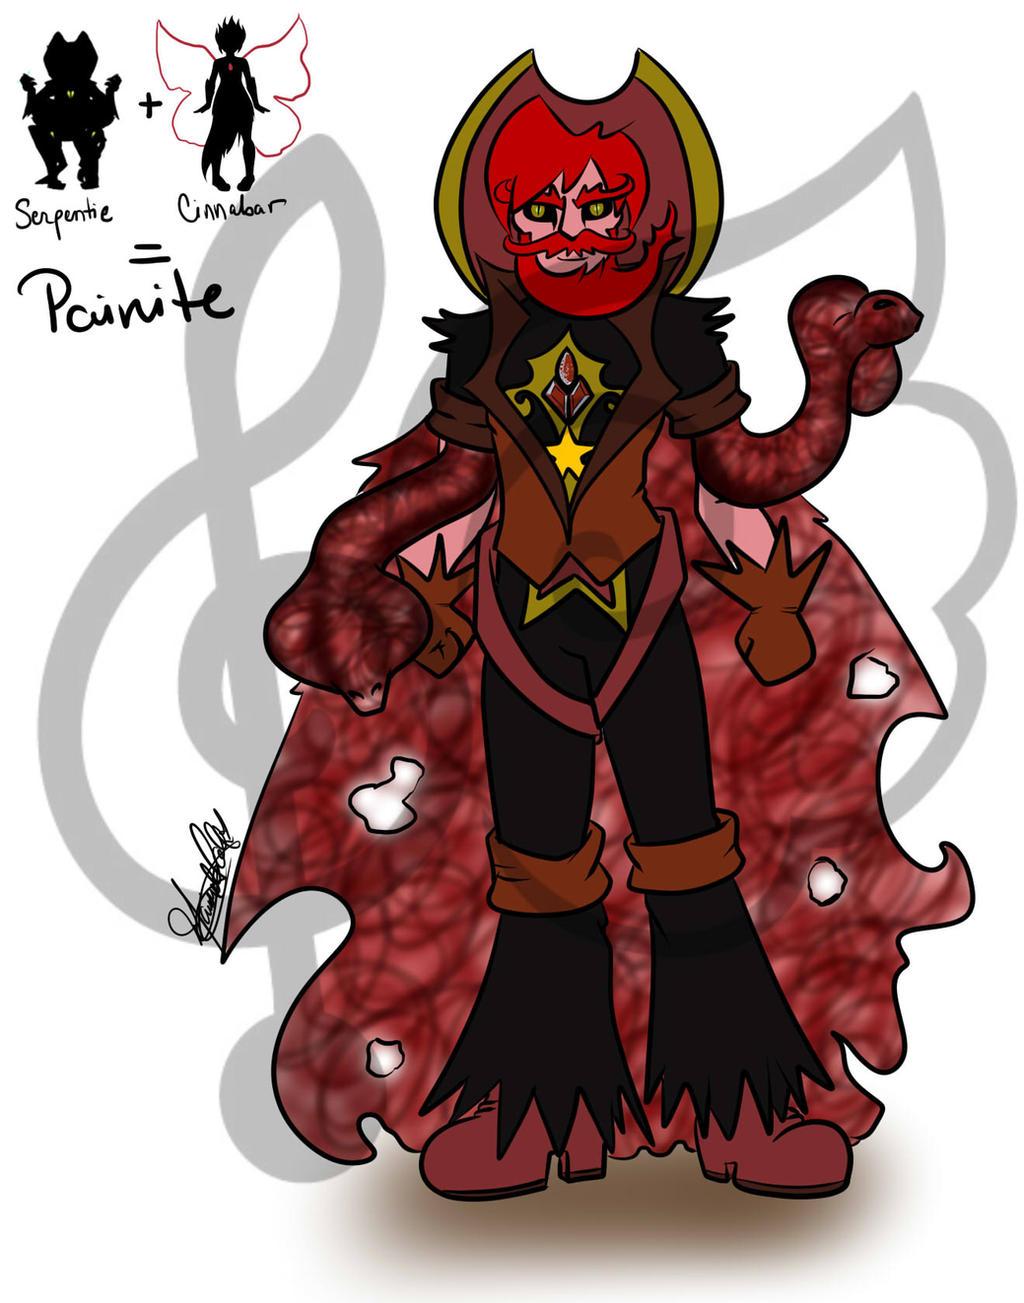 Painite Steven Universe